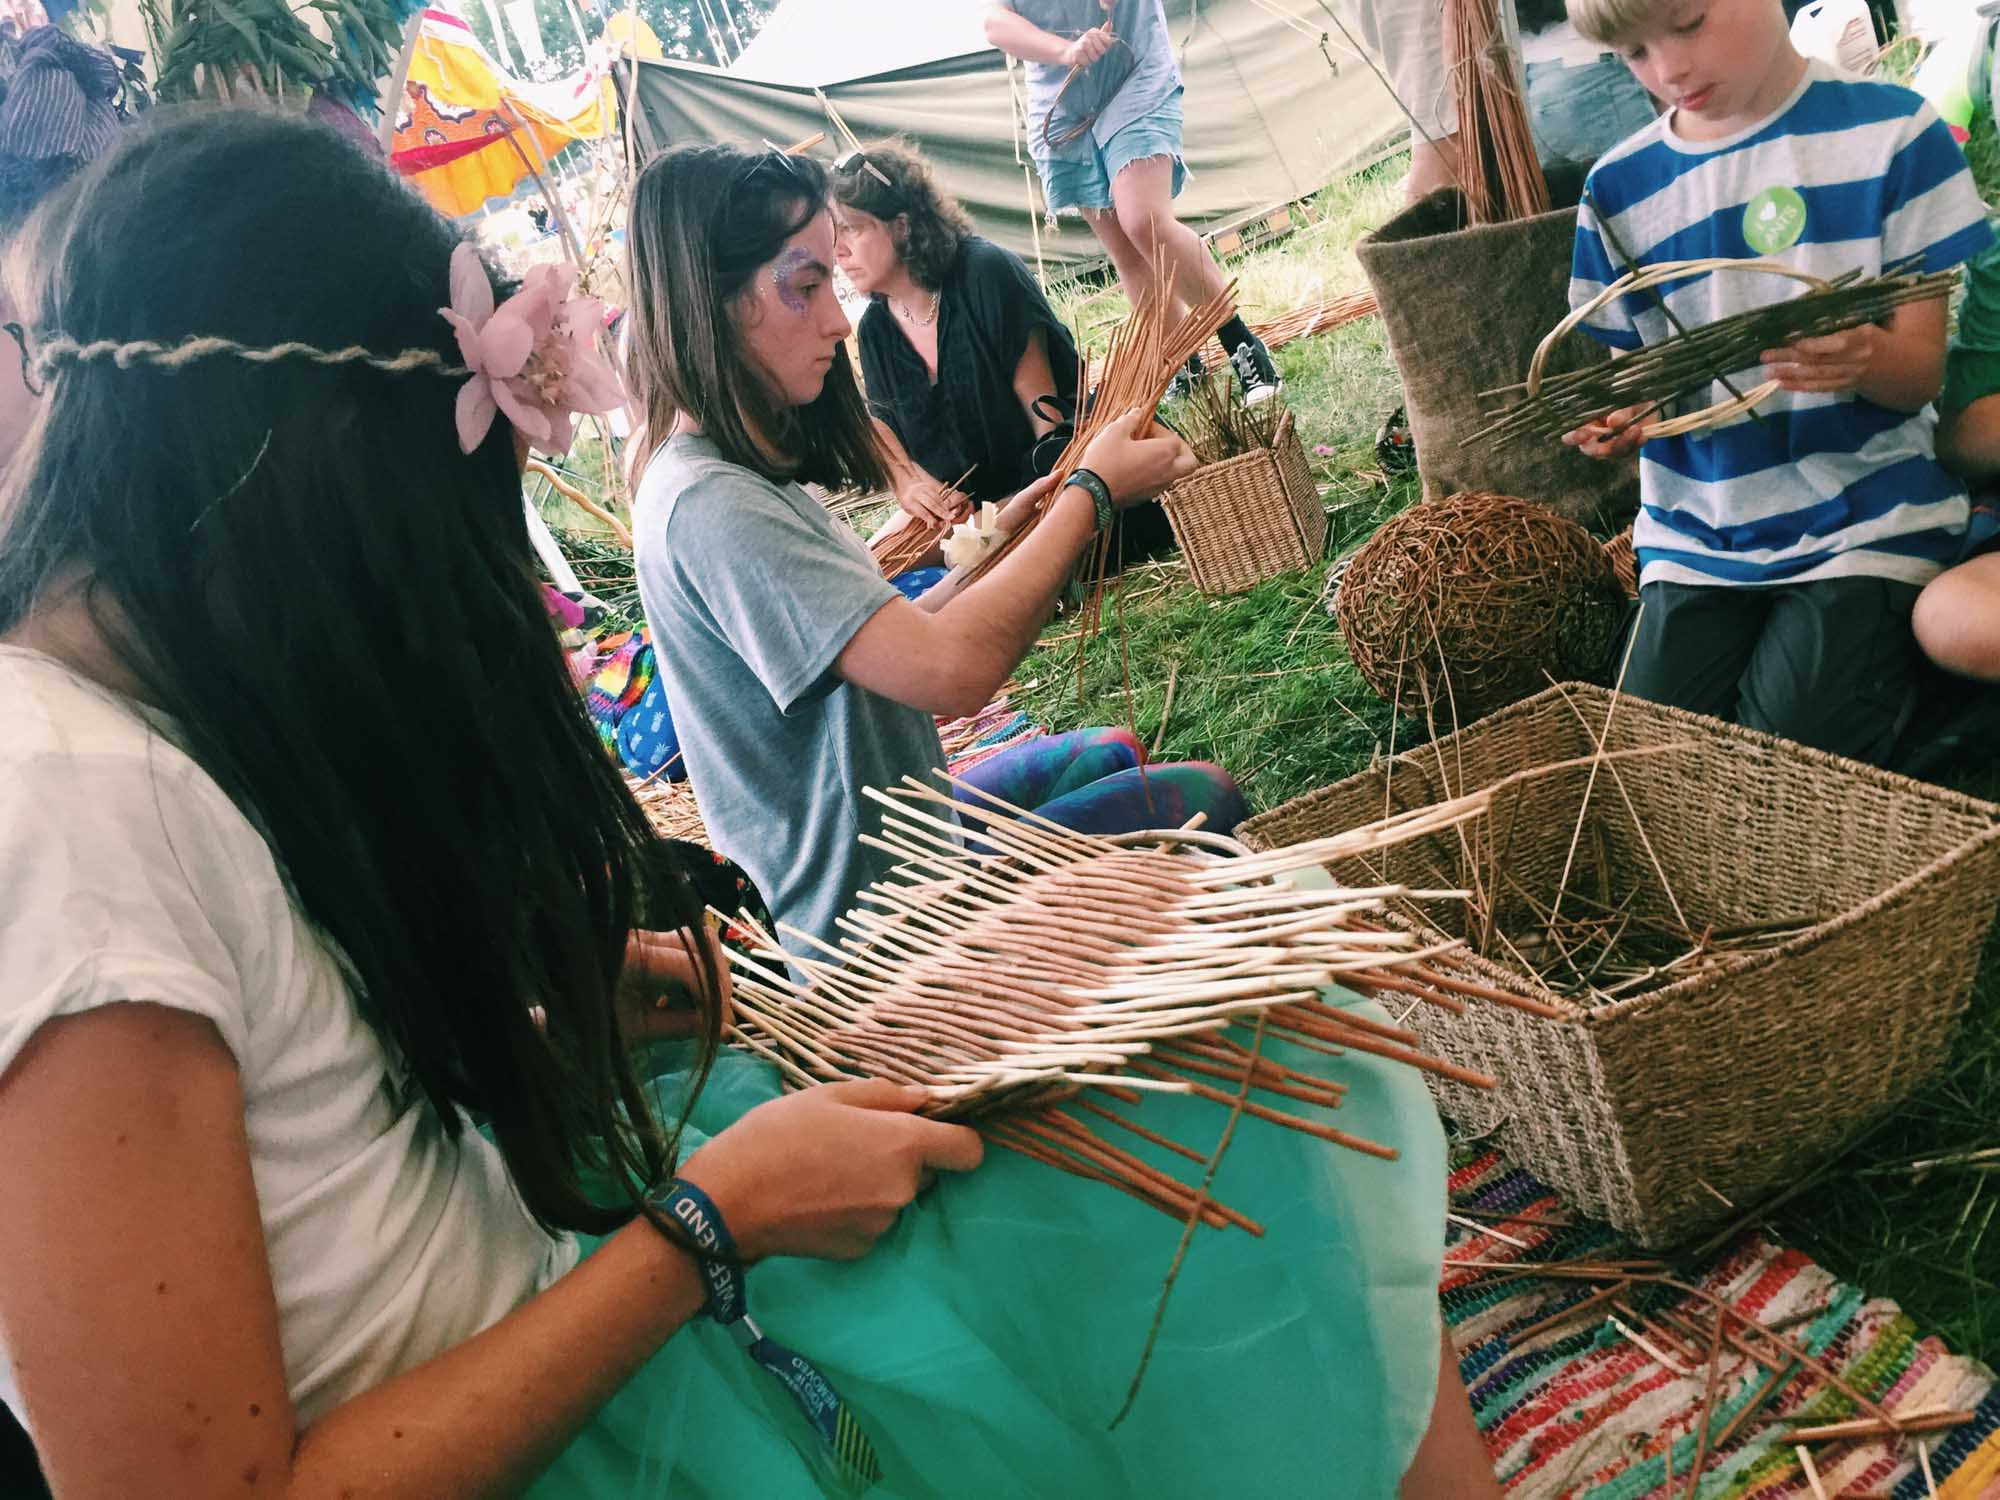 Making baskets at Latitude